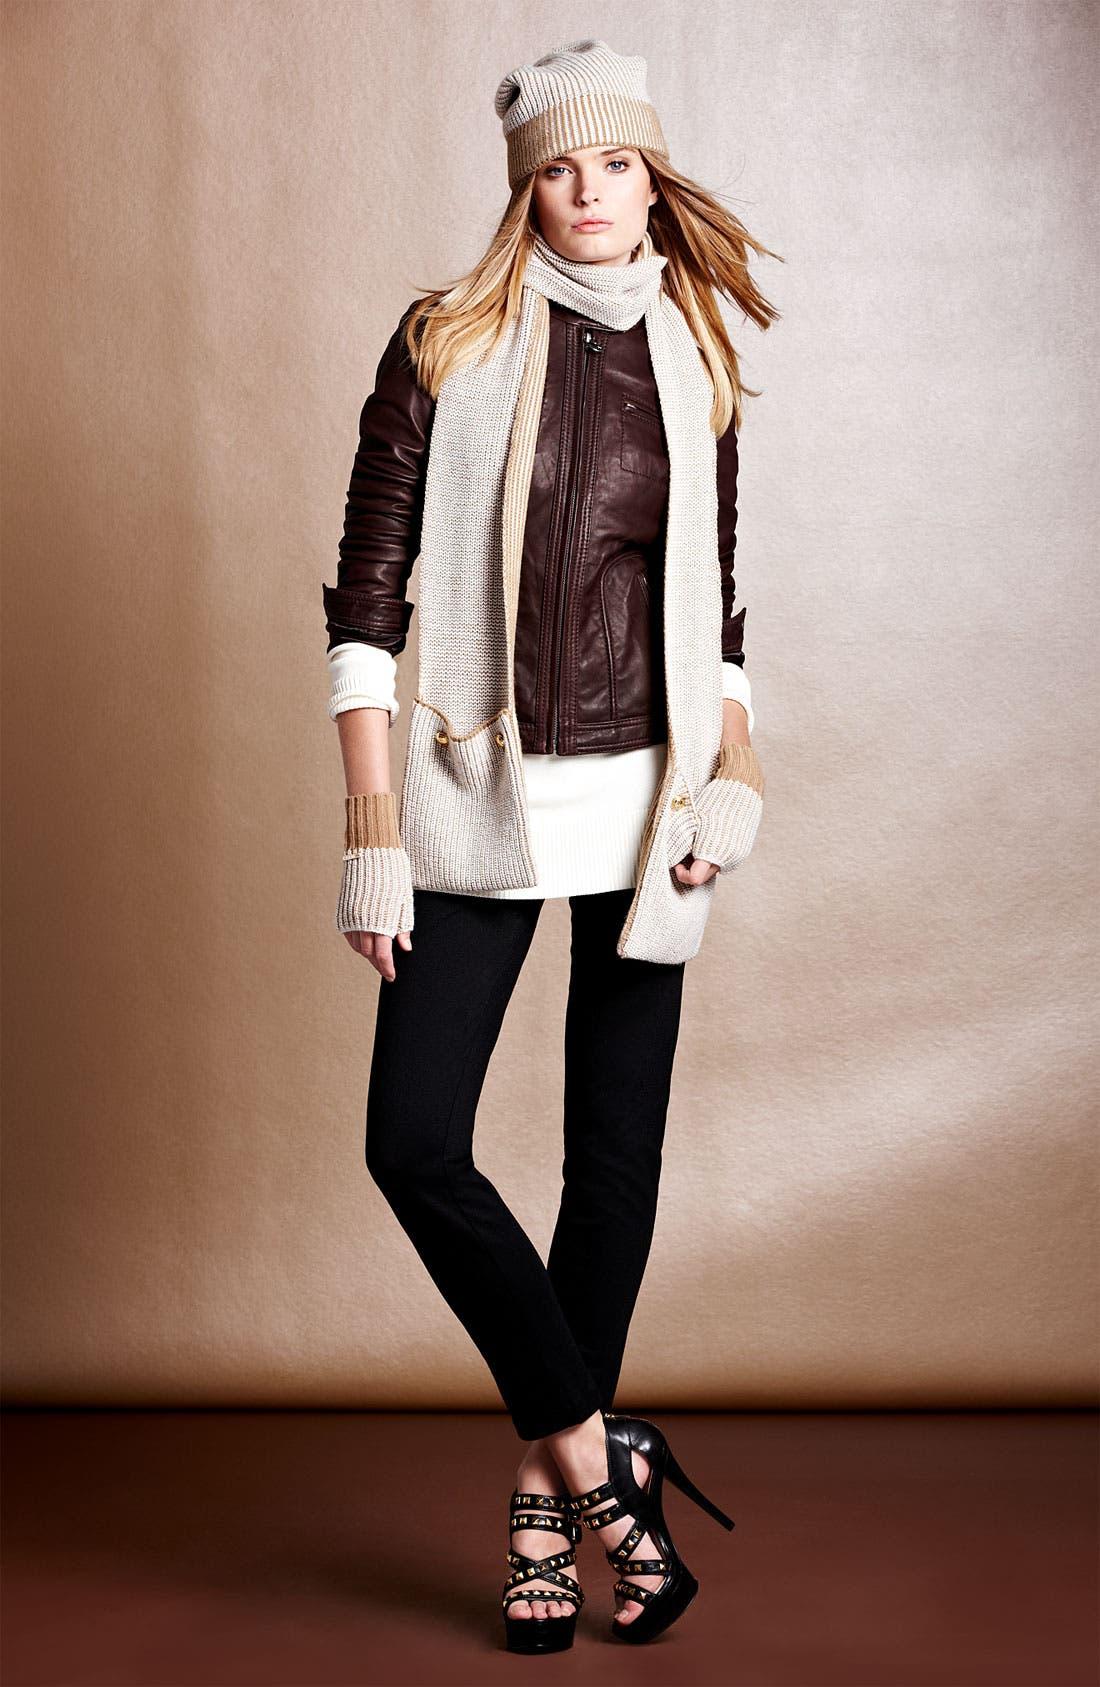 Alternate Image 1 Selected - MICHAEL Michael Kors Jacket, Pants & Scarf